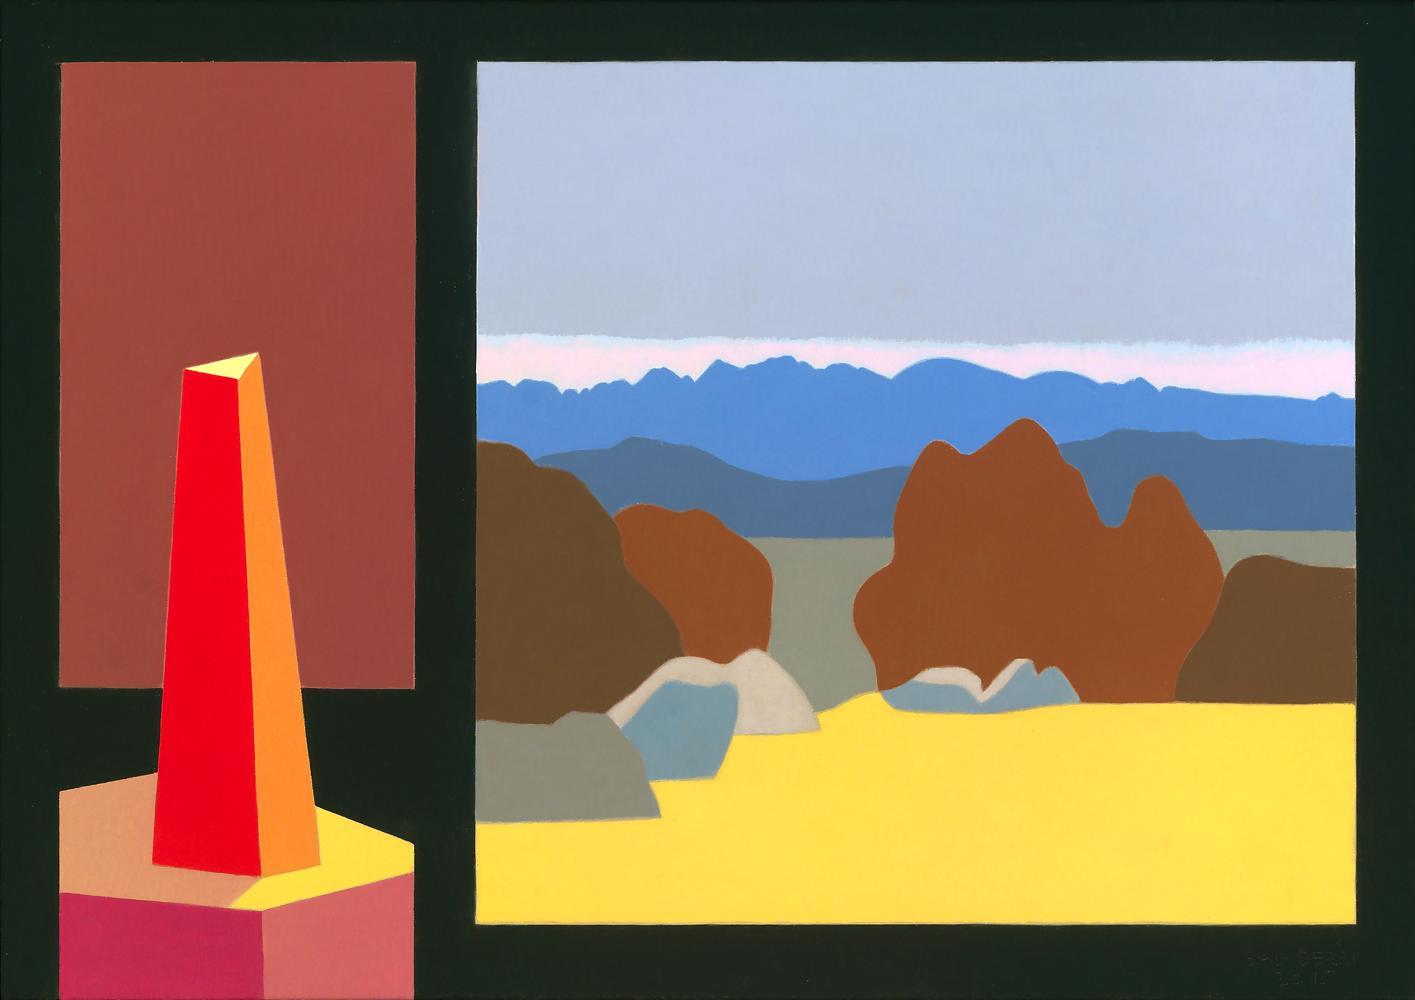 Monolito y Pirineos, 65 x 92 cm, óleo lienzo, 2015.